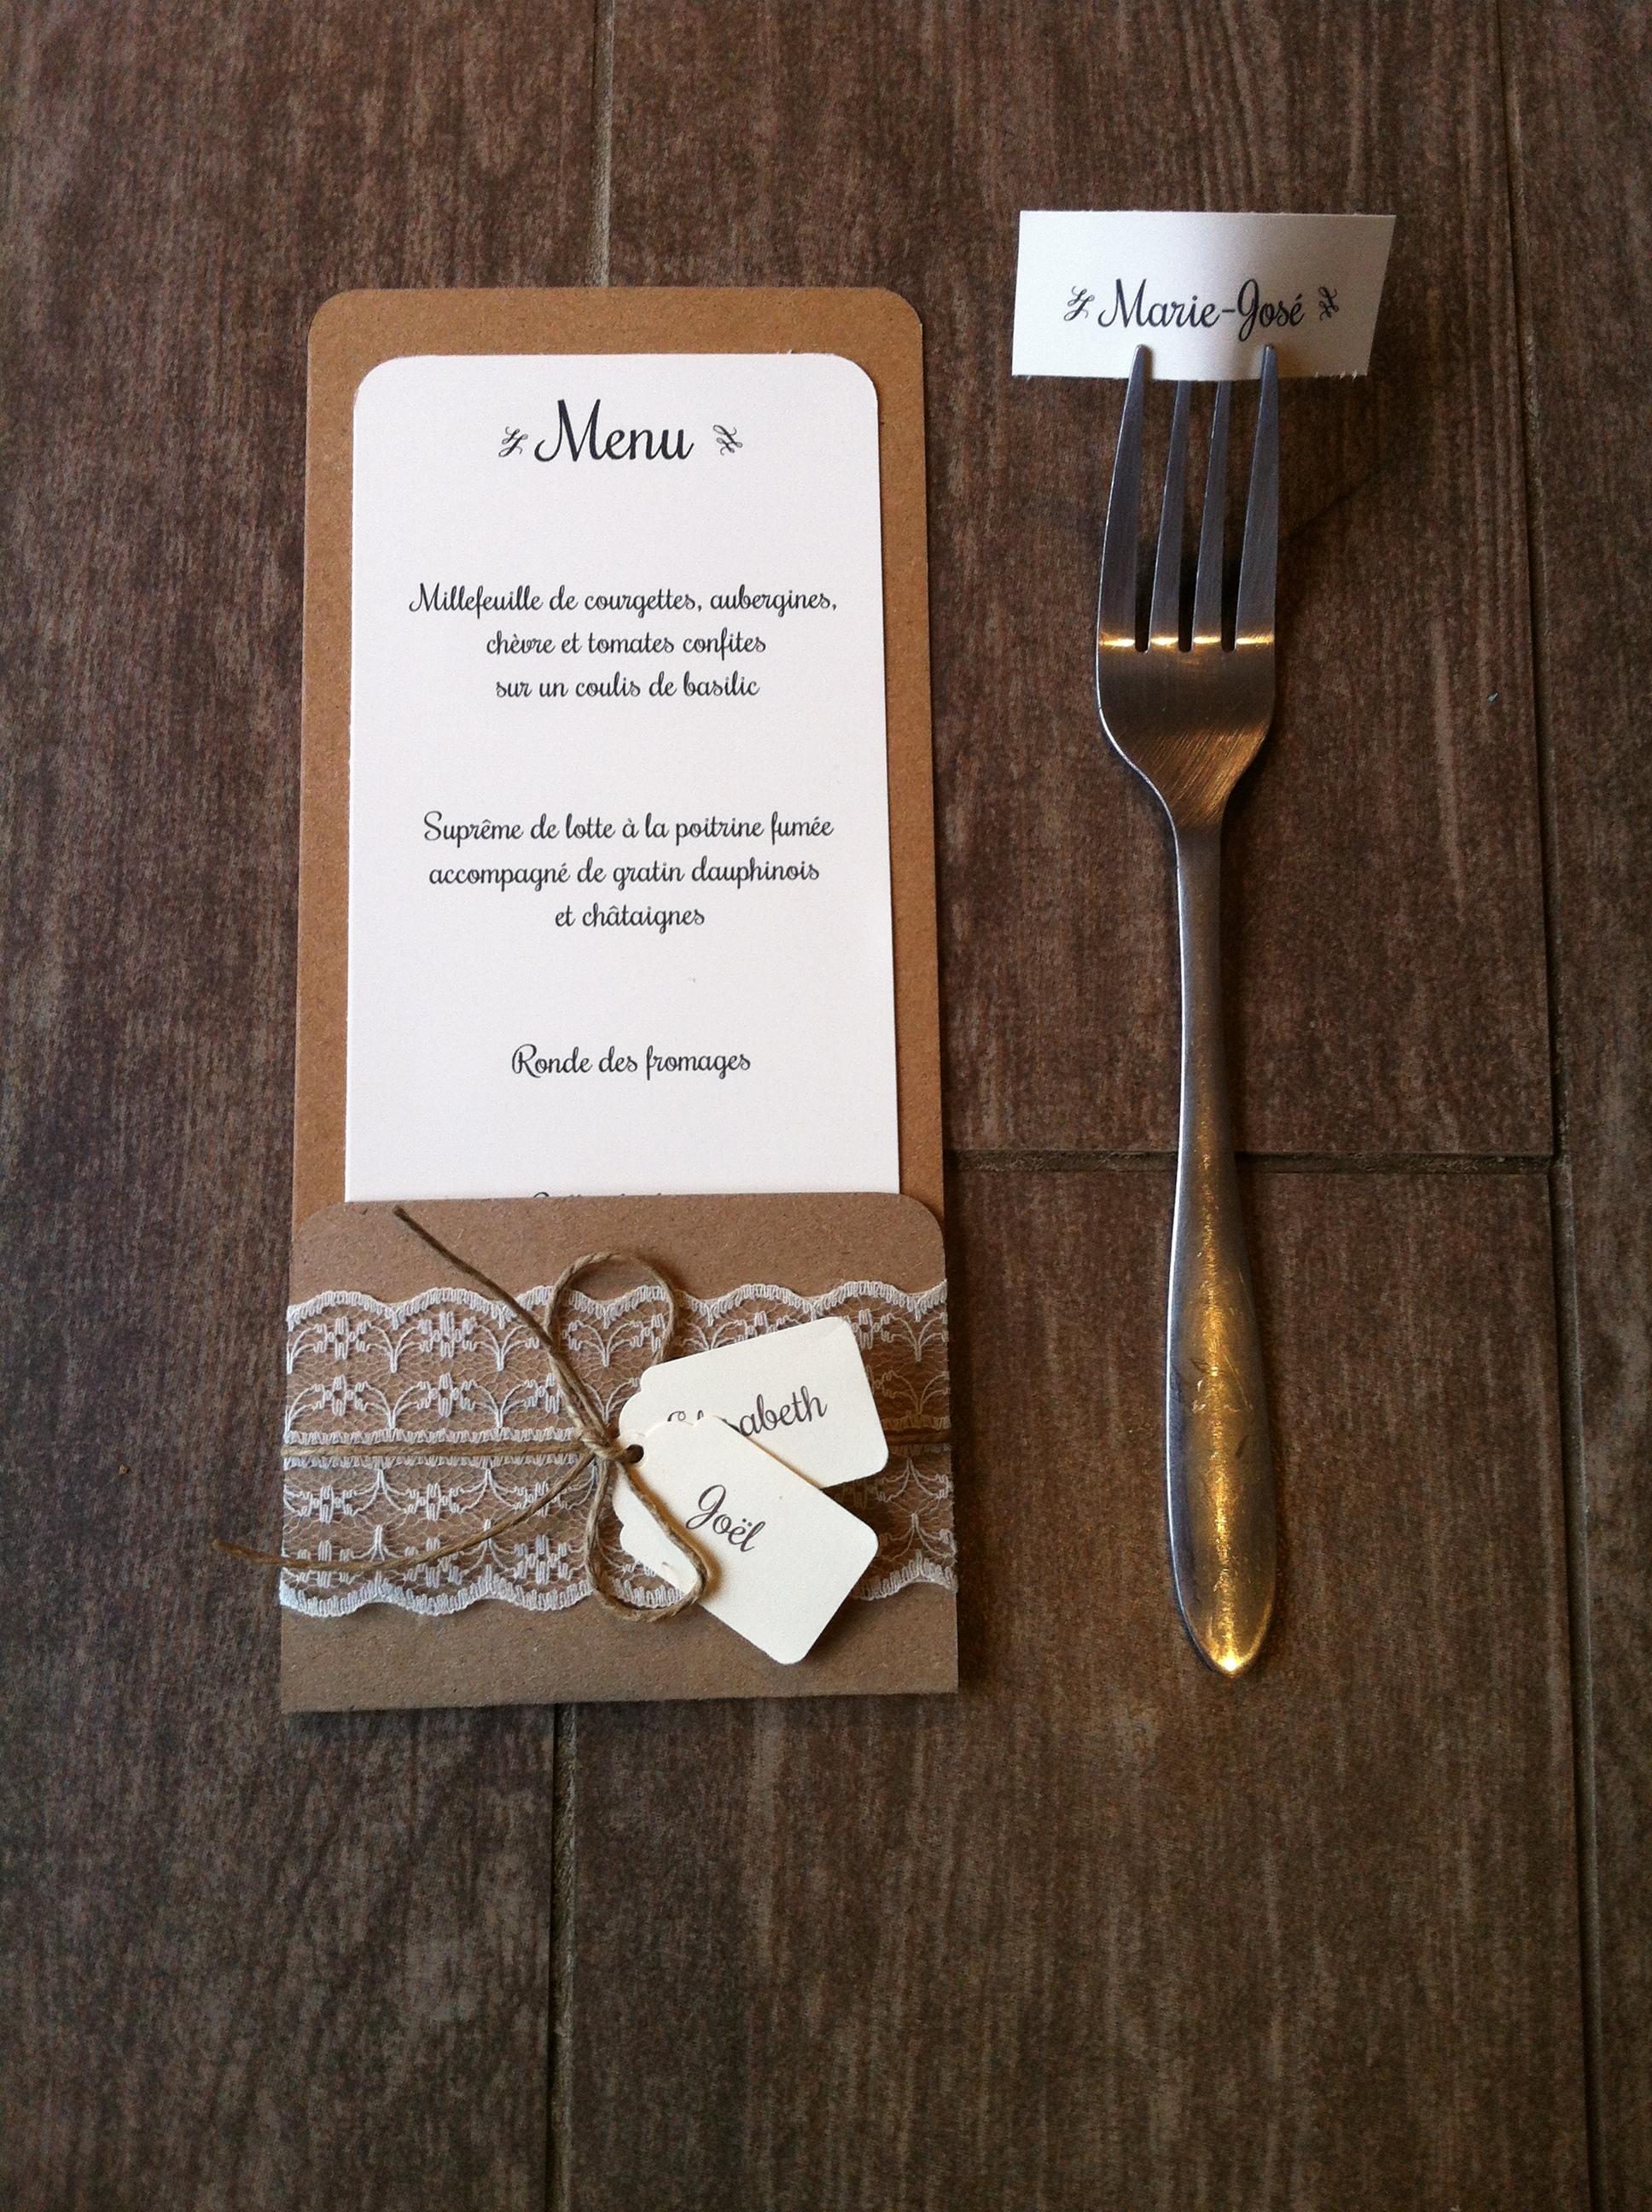 populaire menu mariage champetre bl08 montrealeast. Black Bedroom Furniture Sets. Home Design Ideas